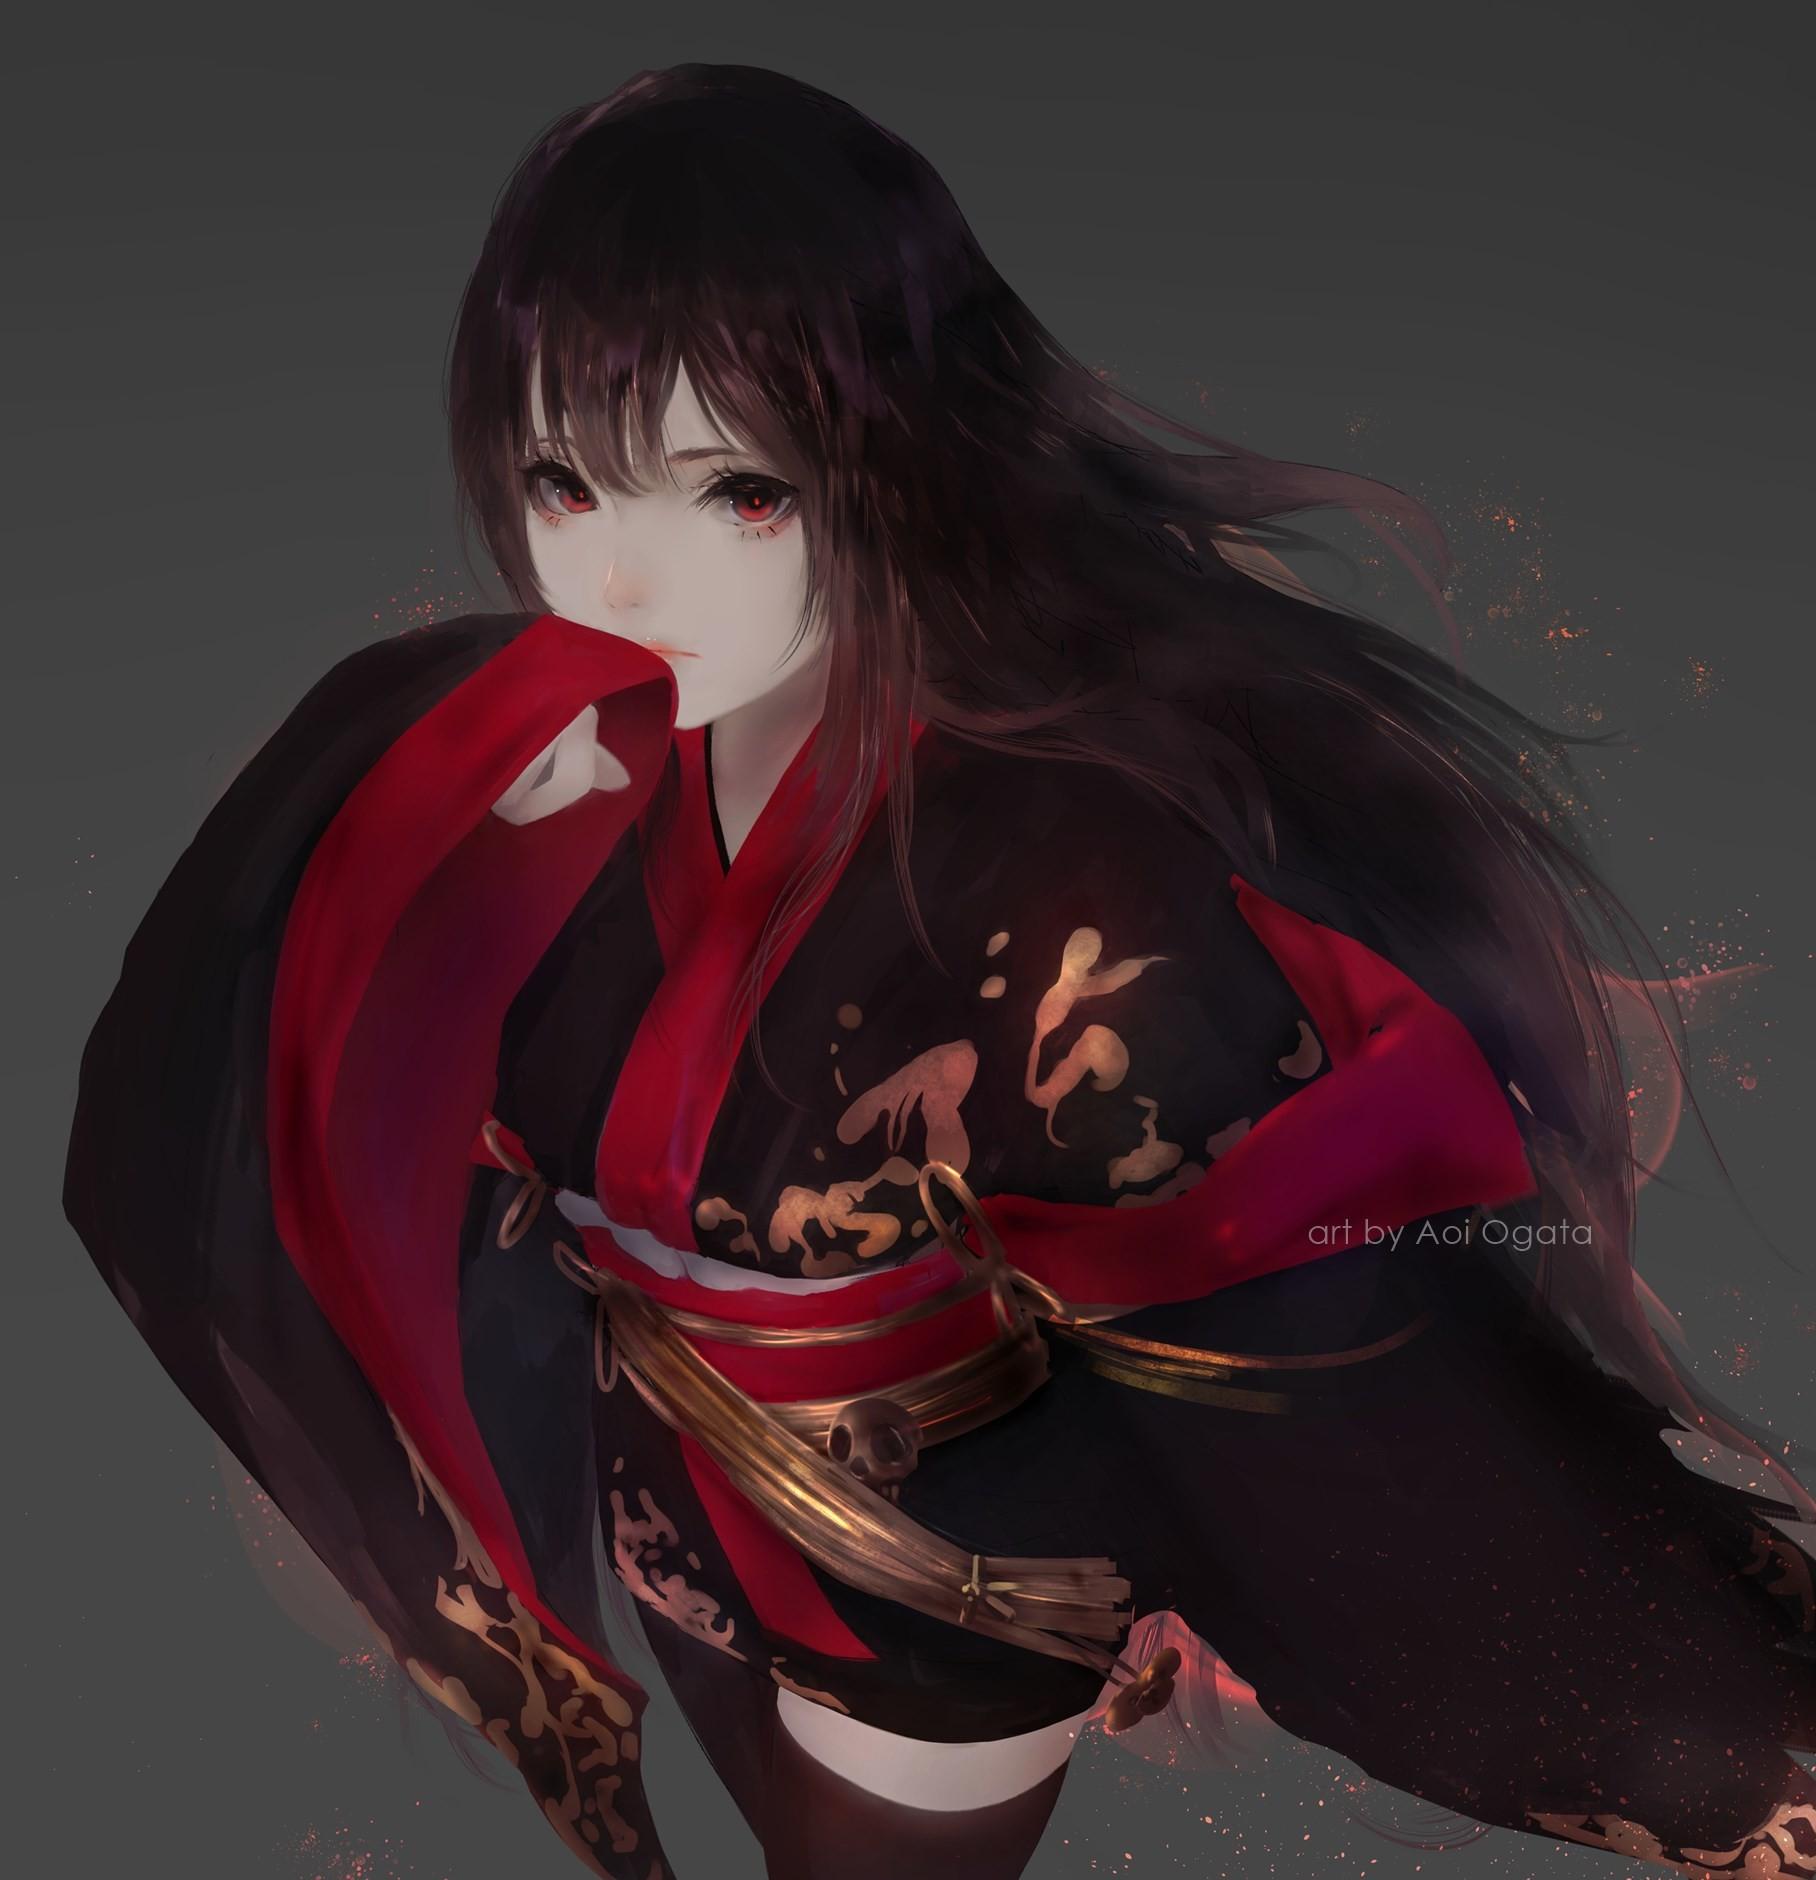 Aoi ogata shinra1111